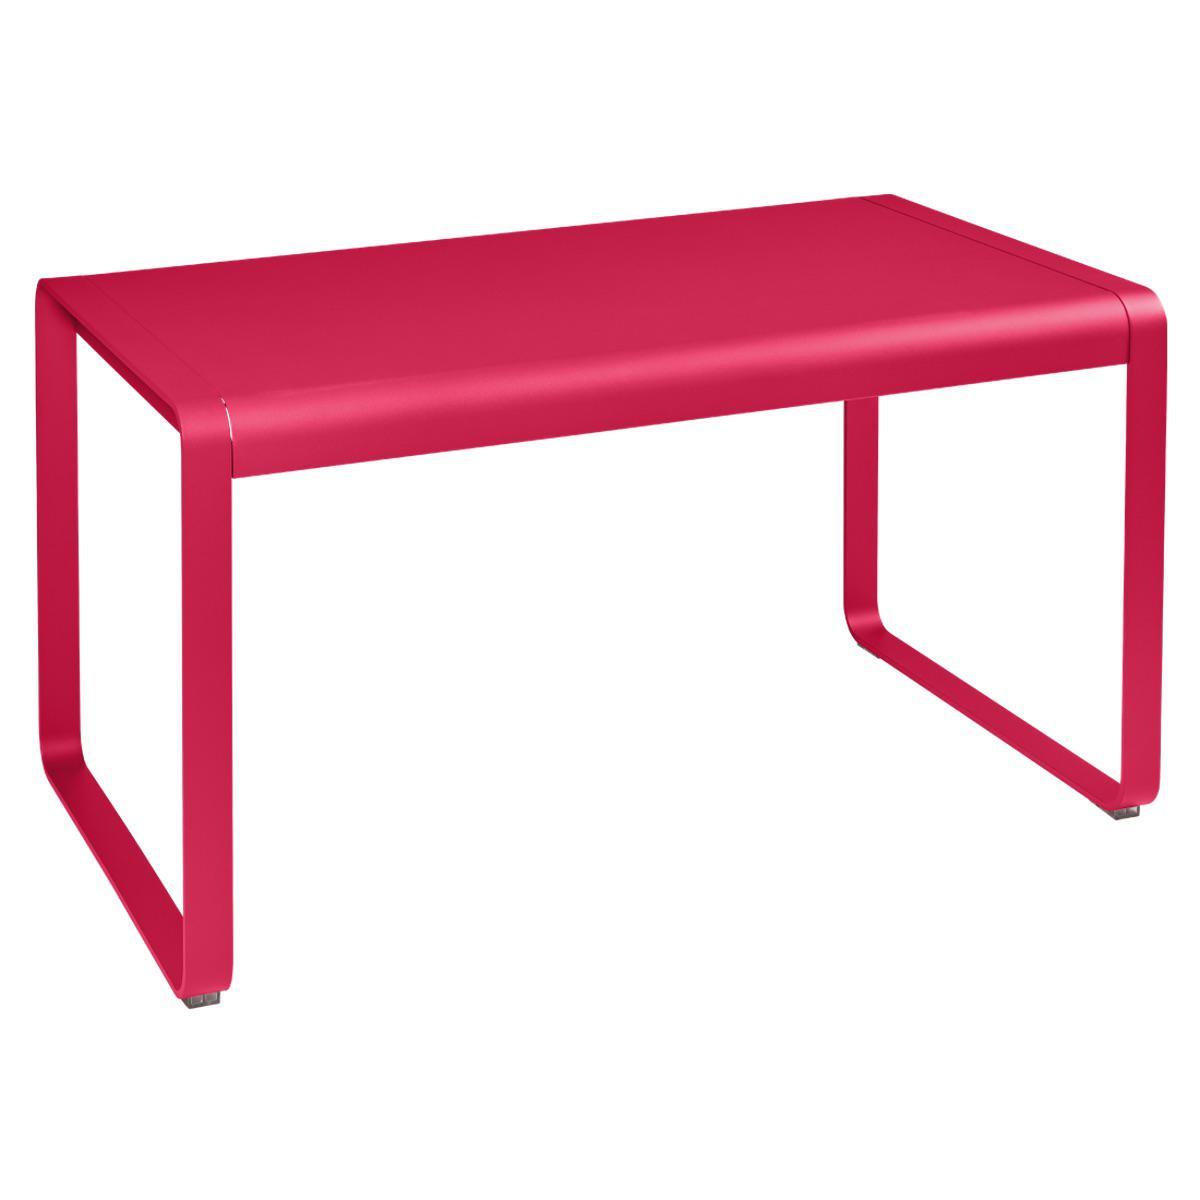 Table de jardin 80x140cm BELLEVIE Fermob rose praline